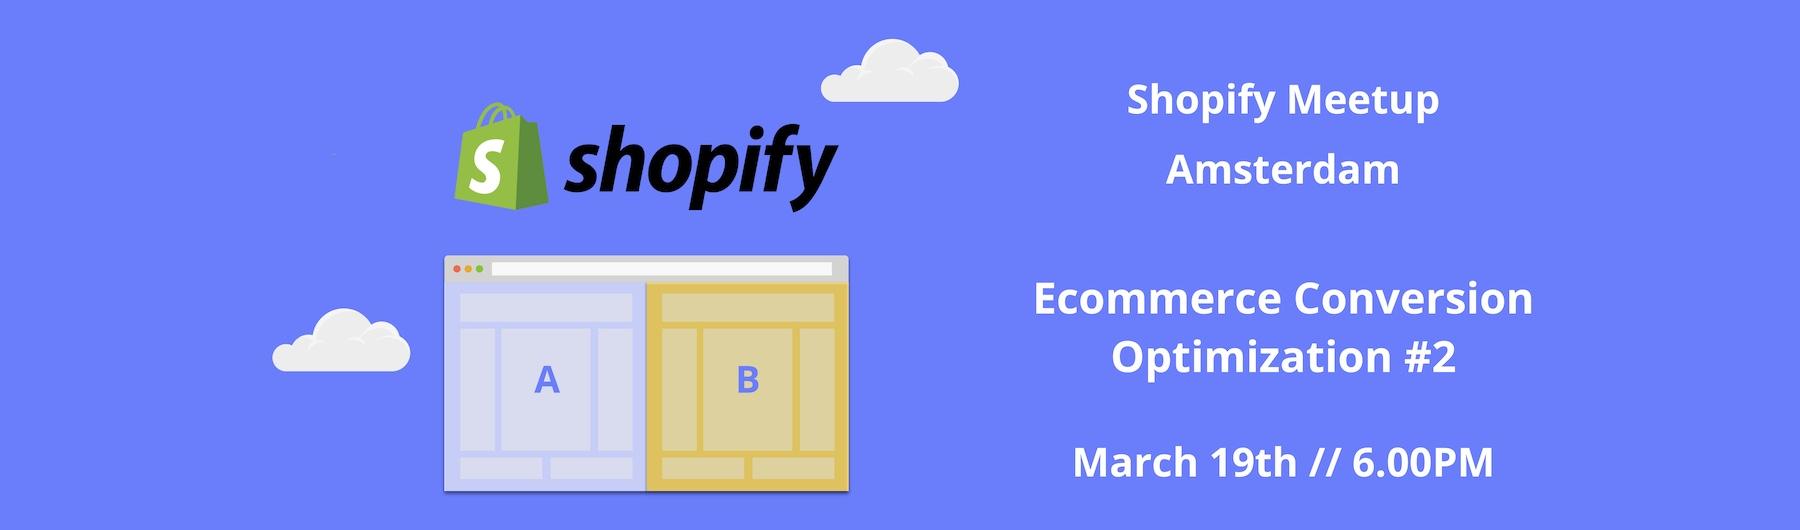 Shopify Meetup Amsterdam